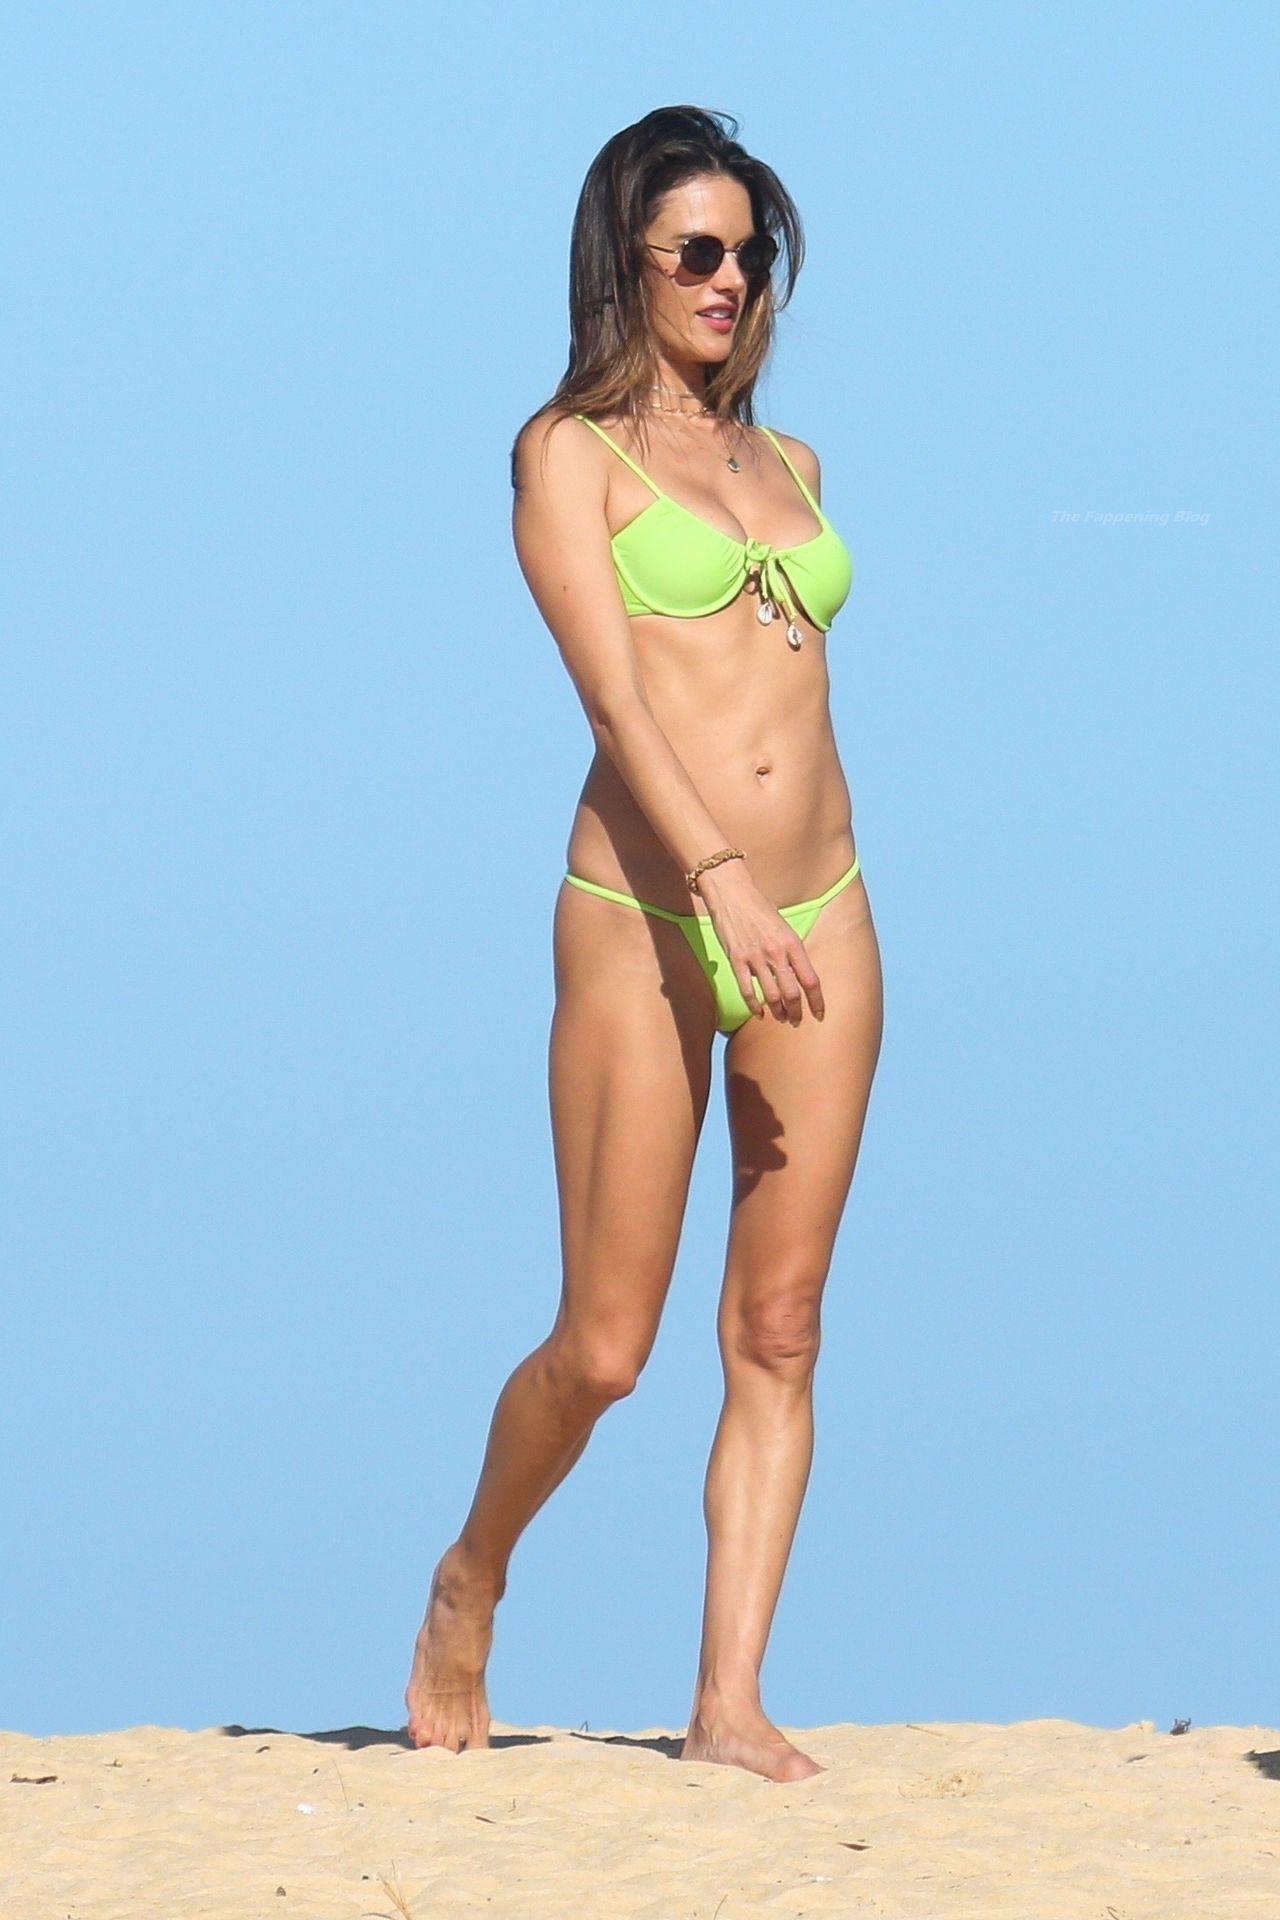 Alessandra-Ambrosio-Sexy-The-Fappening-Blog-861.jpg